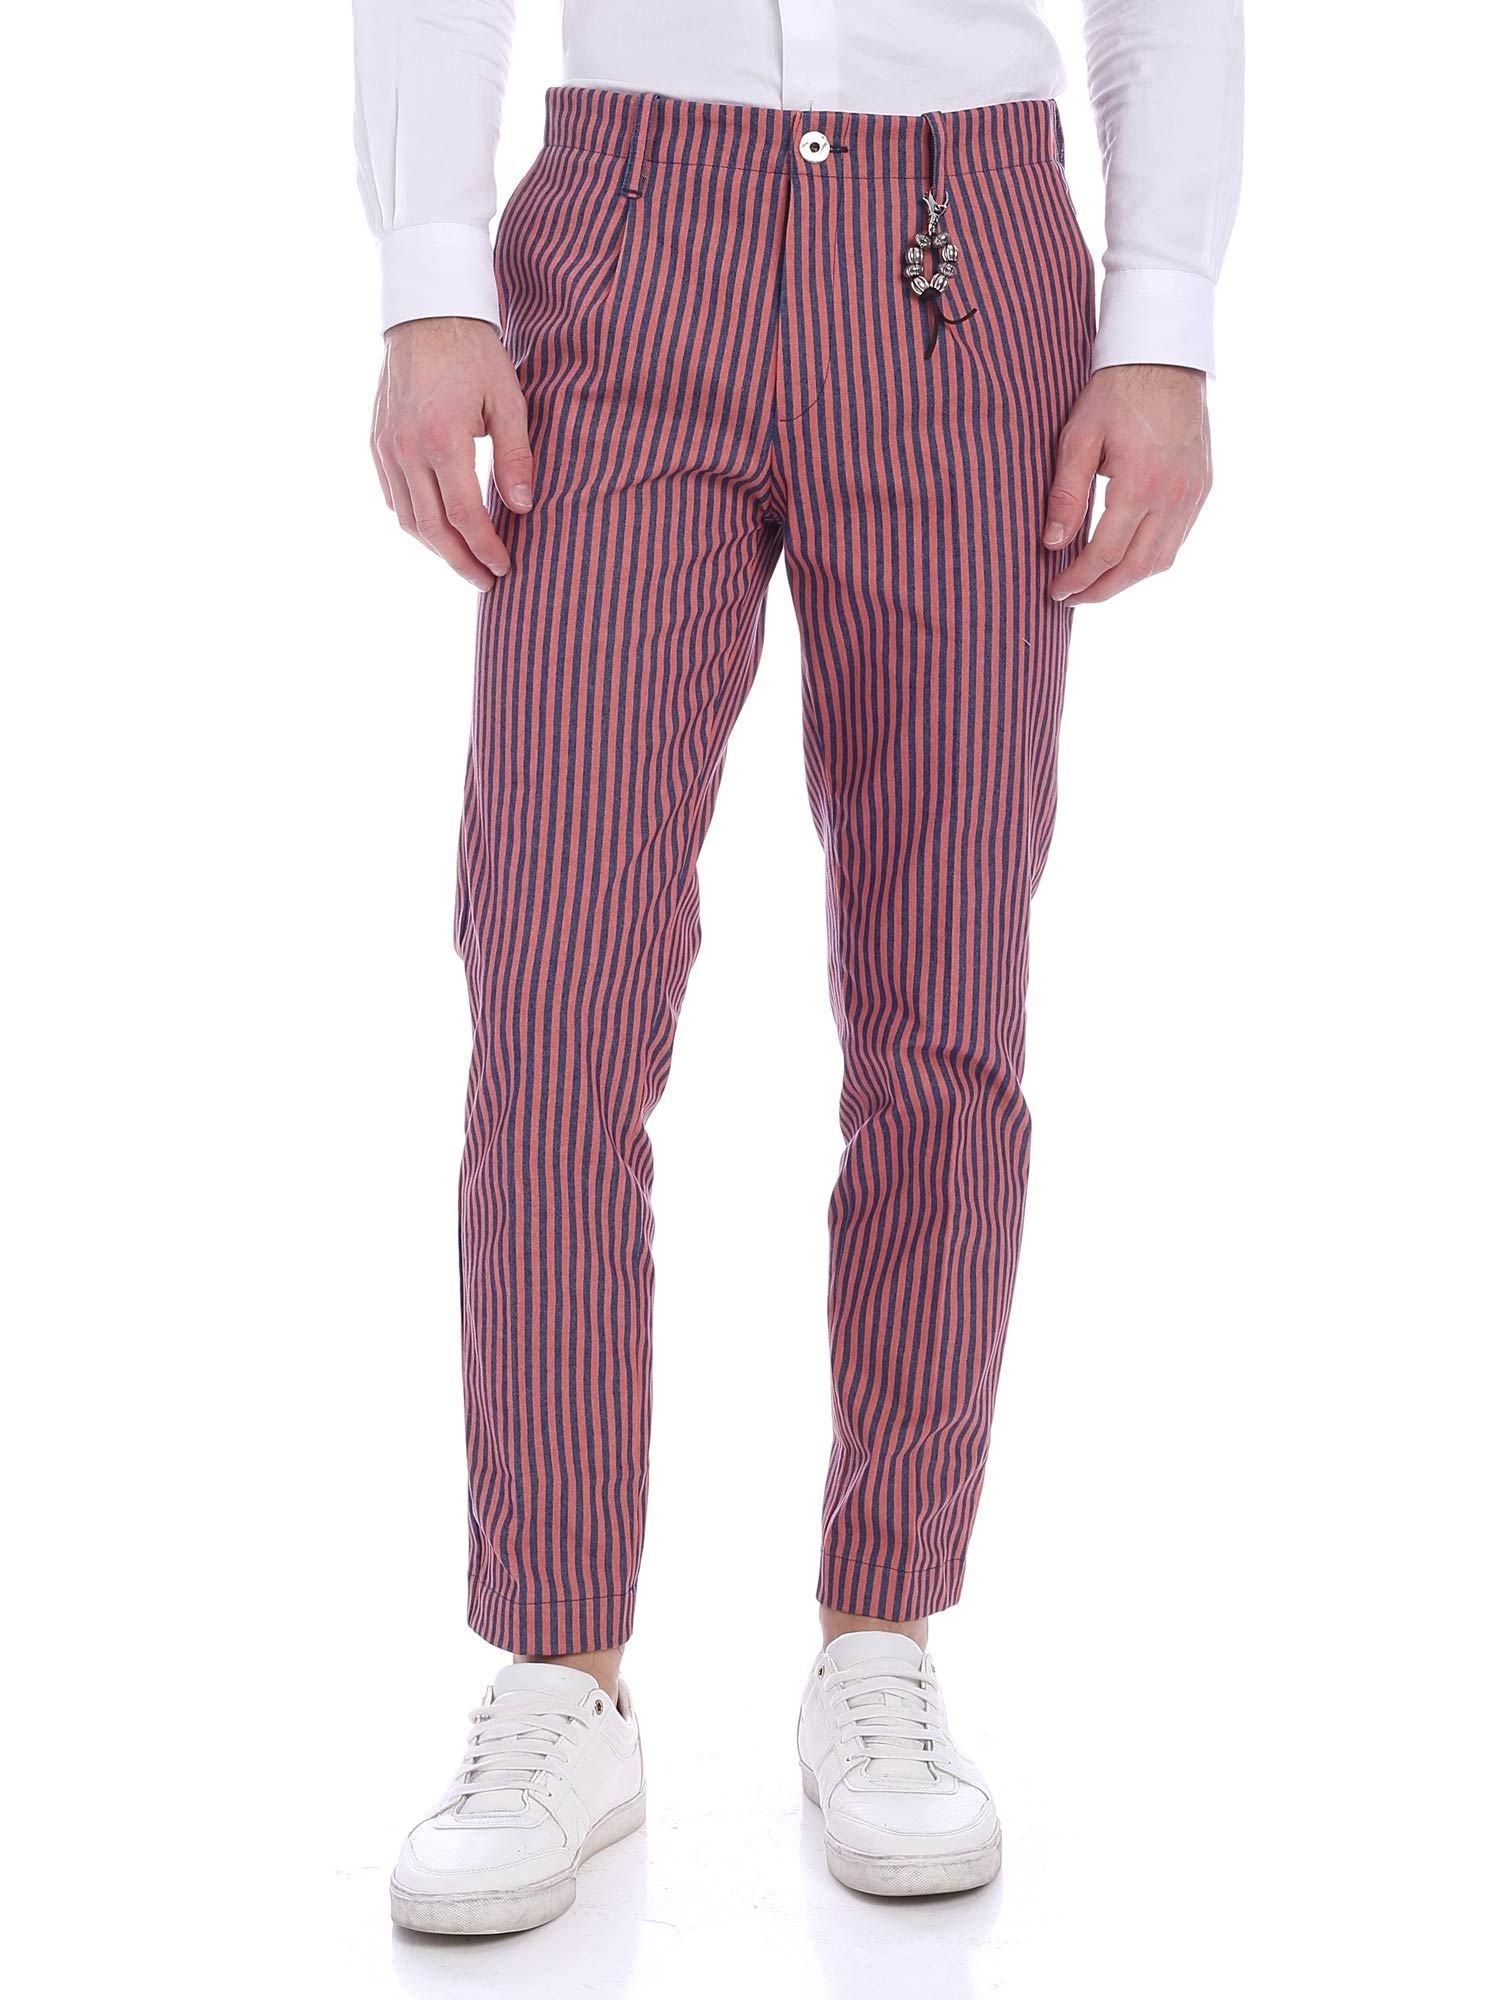 Image of Pantalone una pence riga blu rossa R92 D-BR